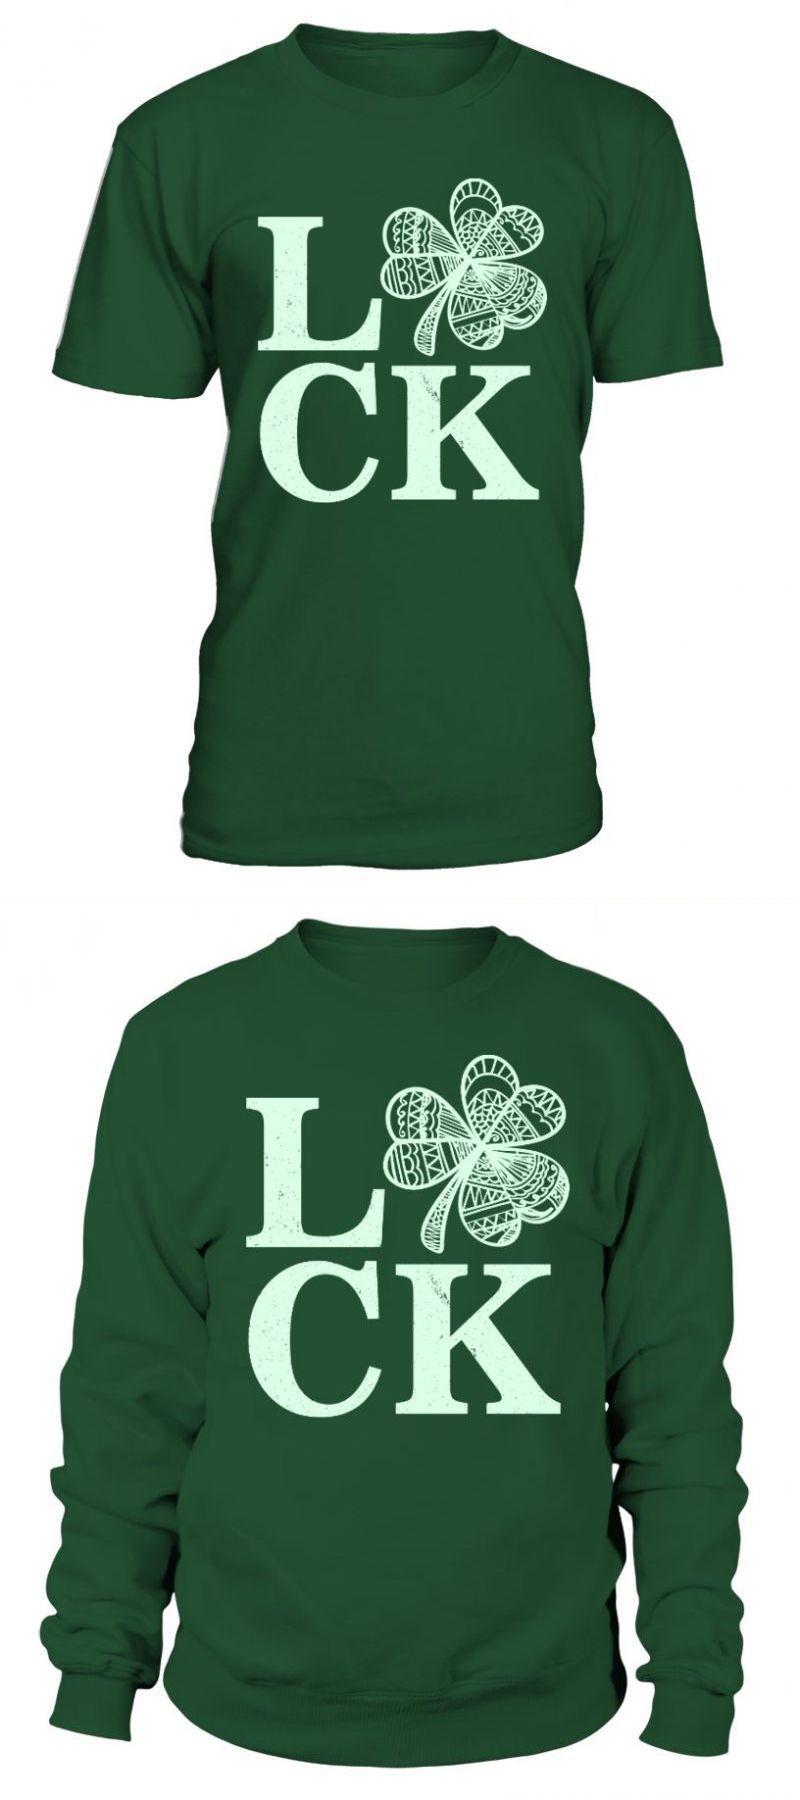 Mardi Gras T Shirt Dresses Luck St Patricks Mardi Gras T Shirts Amazon T Shirt Dress Mardi Gras Shirt